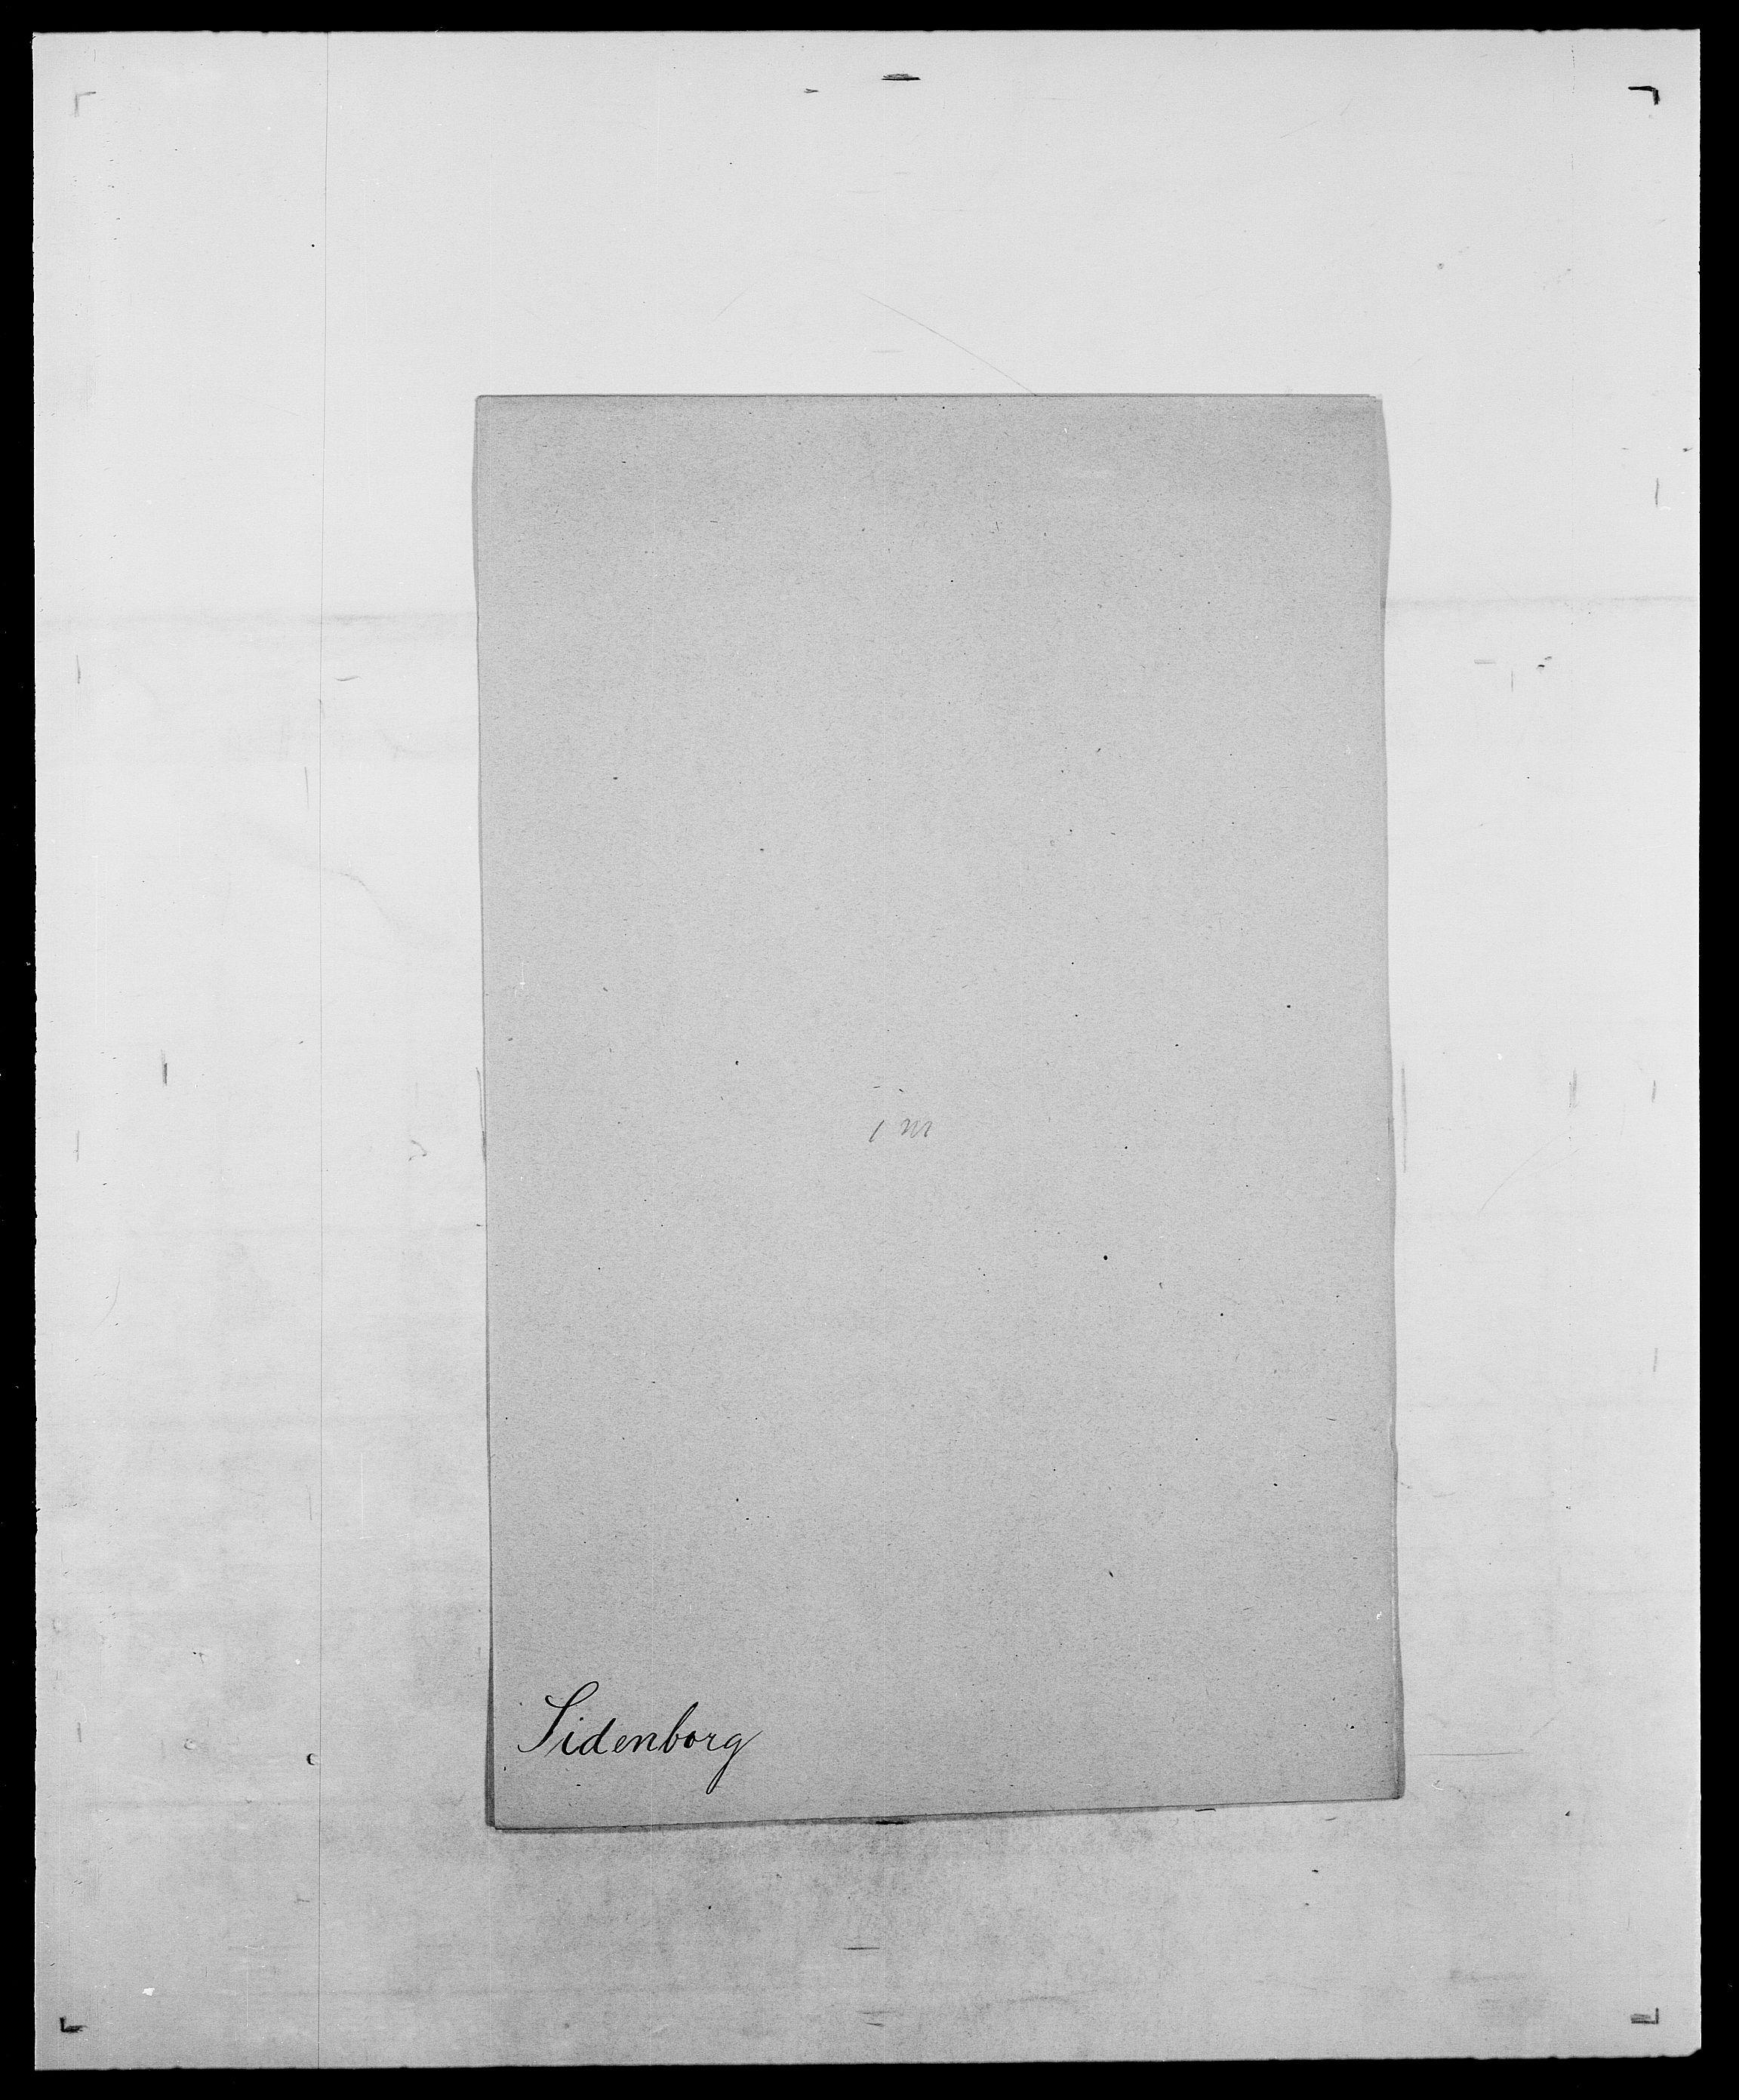 SAO, Delgobe, Charles Antoine - samling, D/Da/L0035: Schnabel - sjetman, s. 761